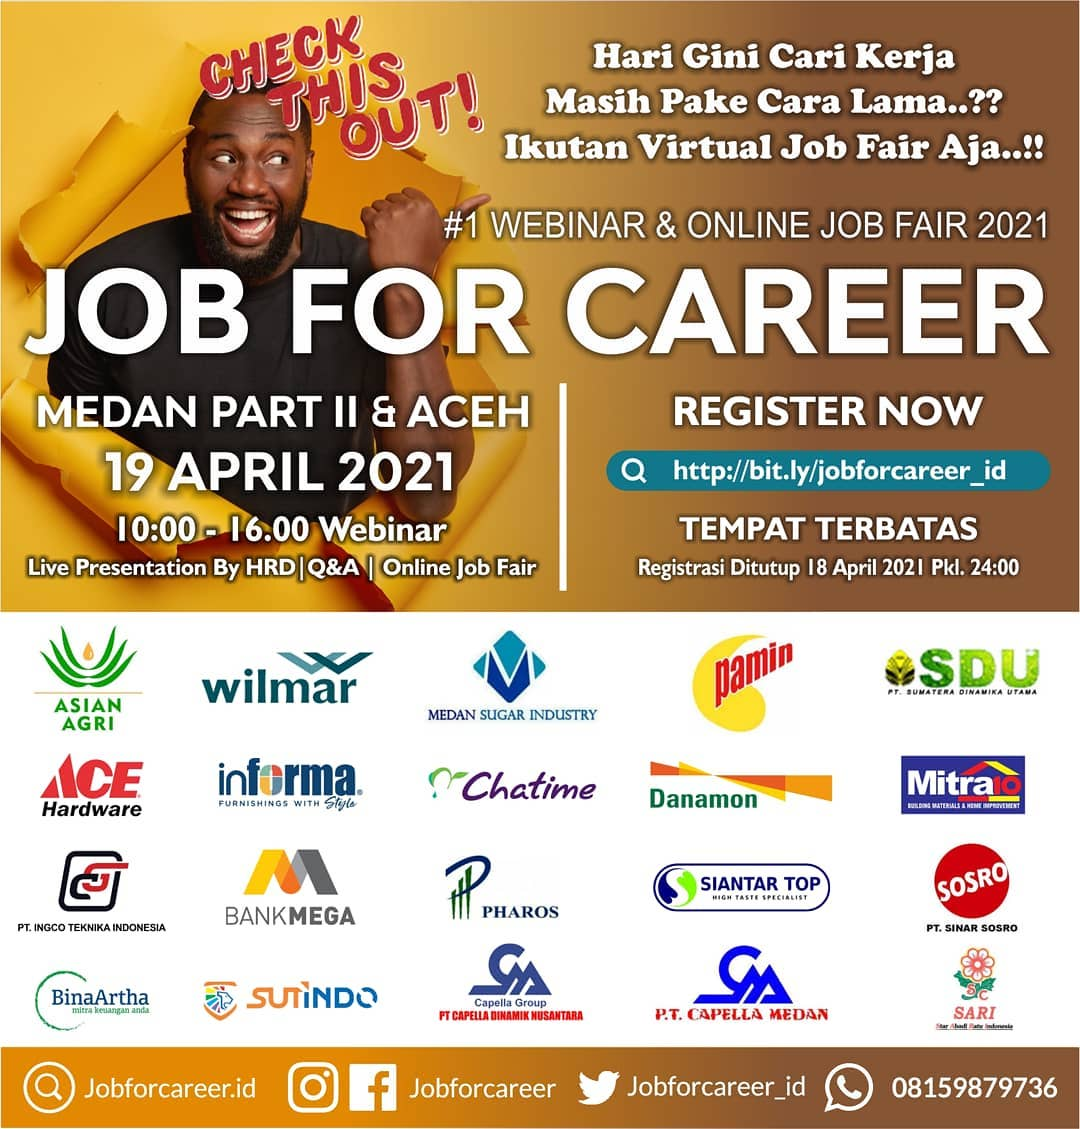 Job For Career Medan Part 2 & Aceh